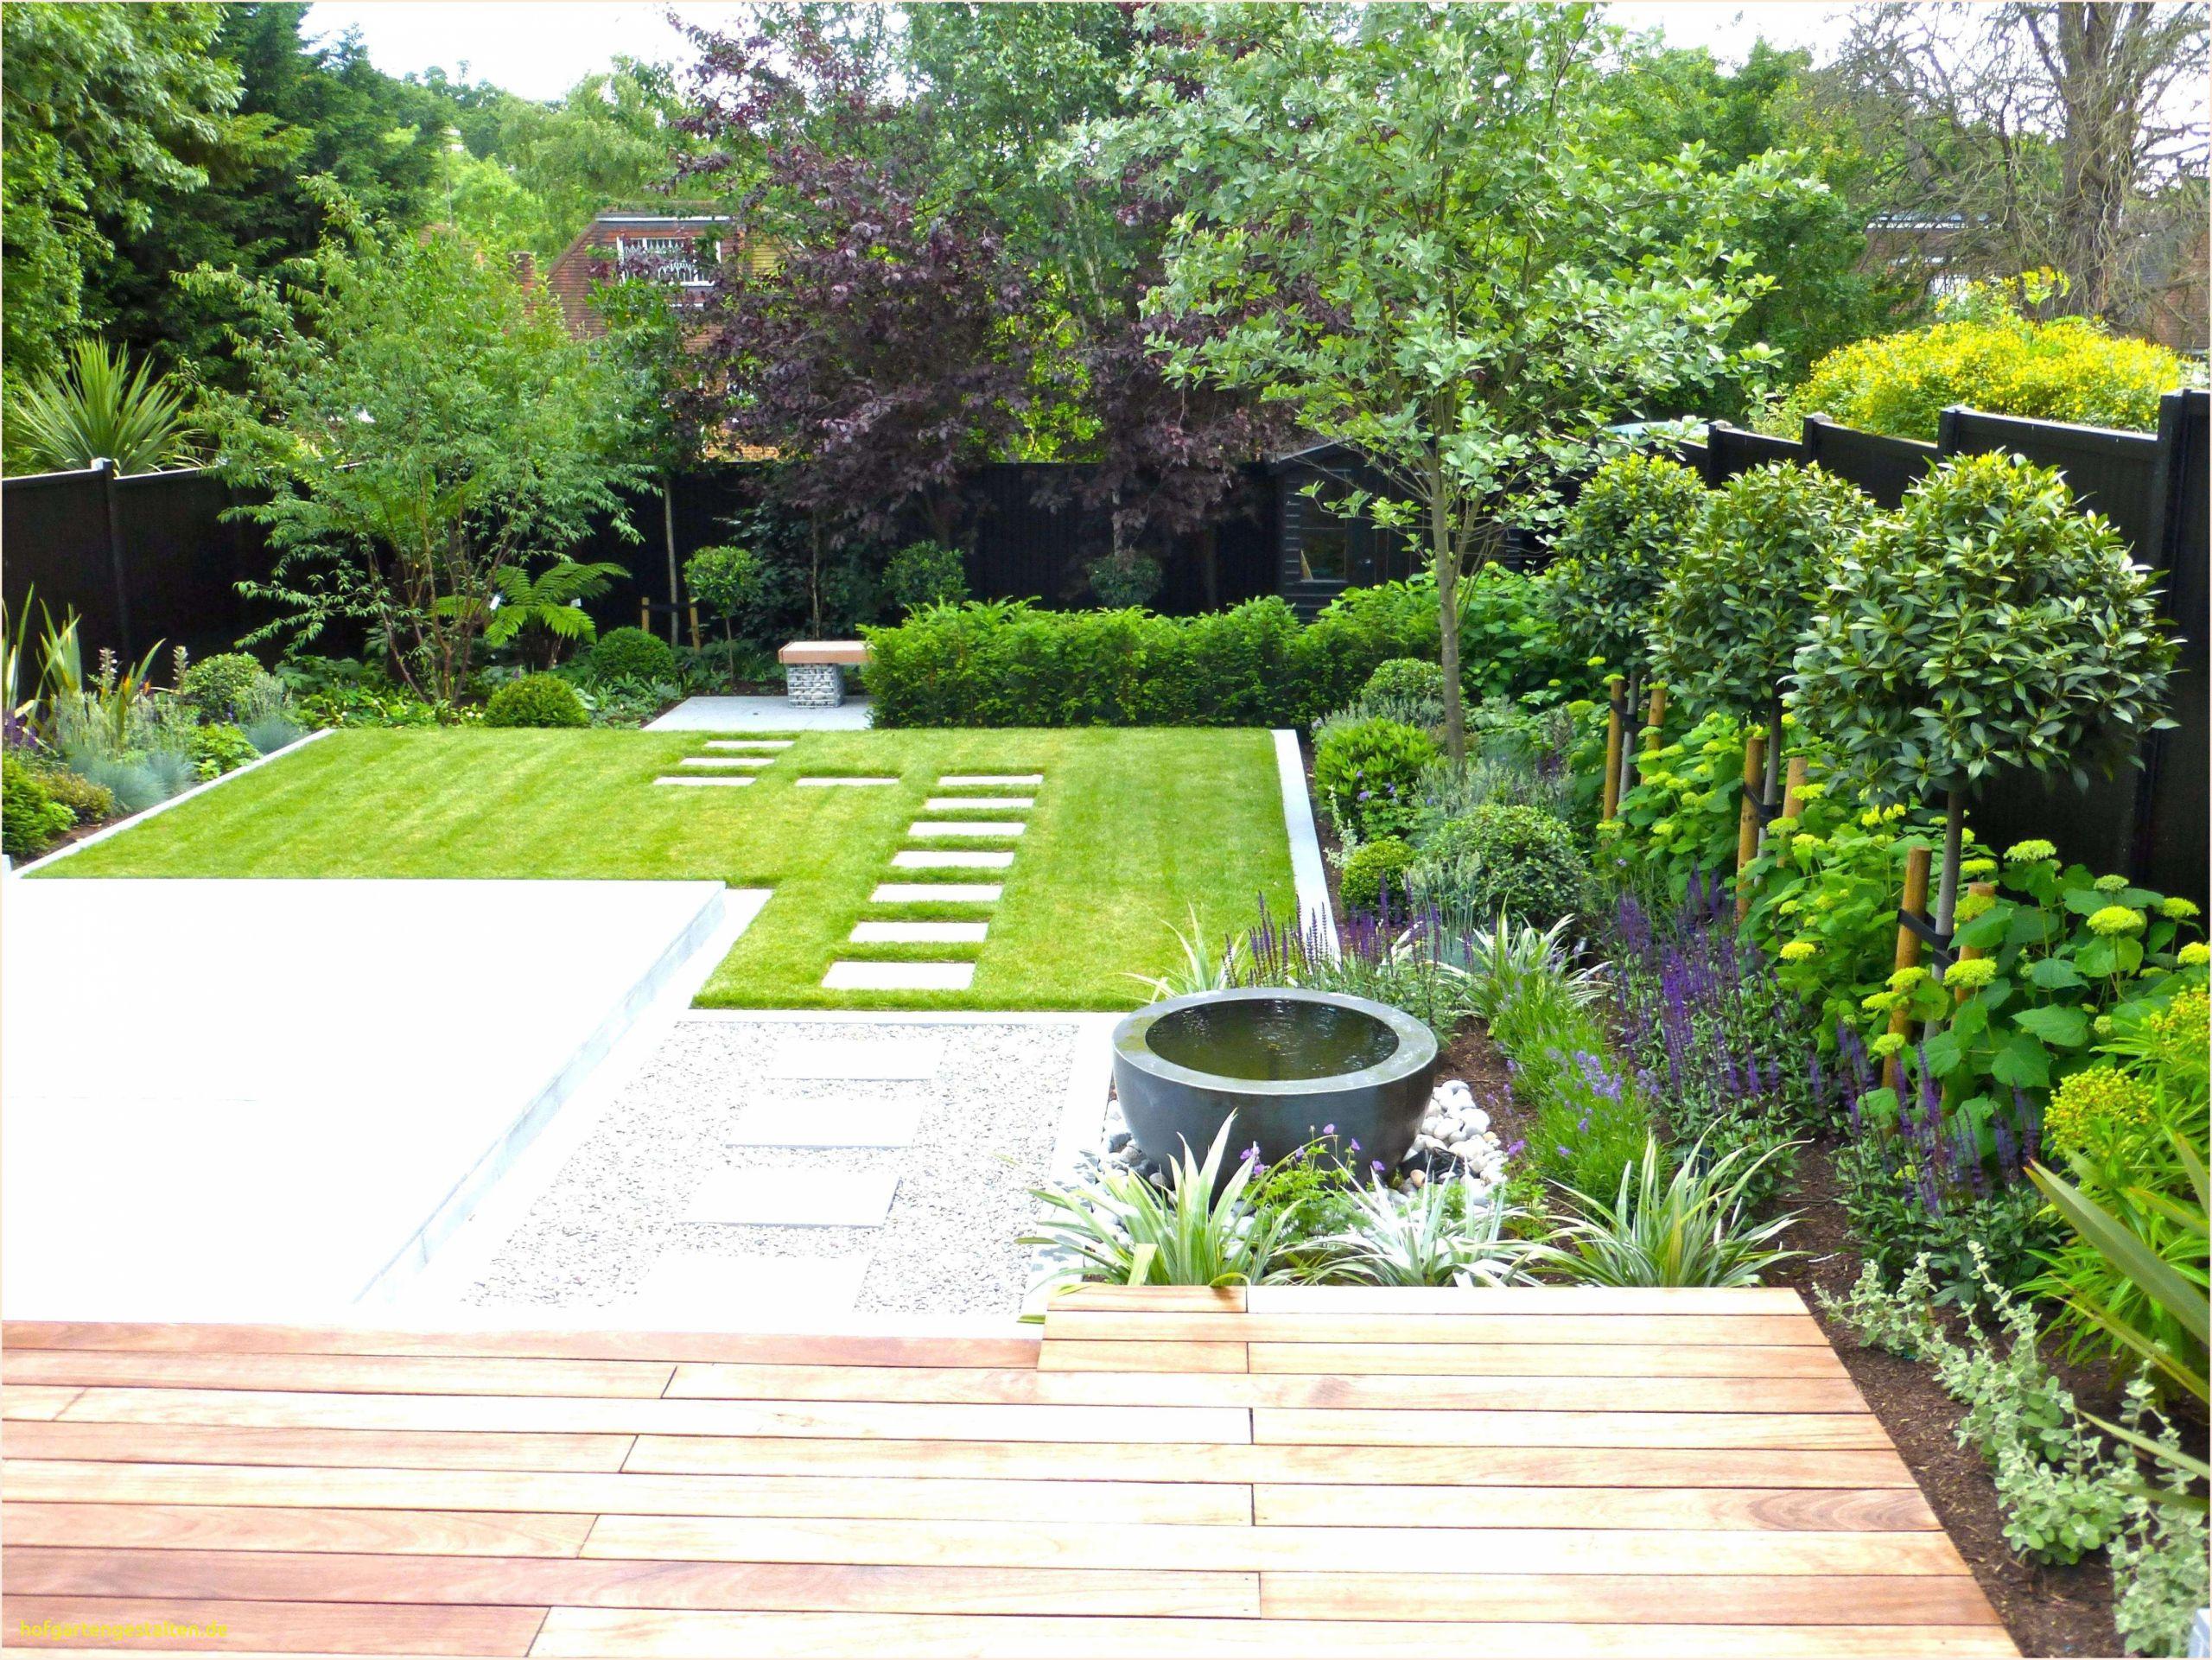 Gartenideen Zum Selbermachen Inspirierend Garten Ideen Selber Machen — Temobardz Home Blog